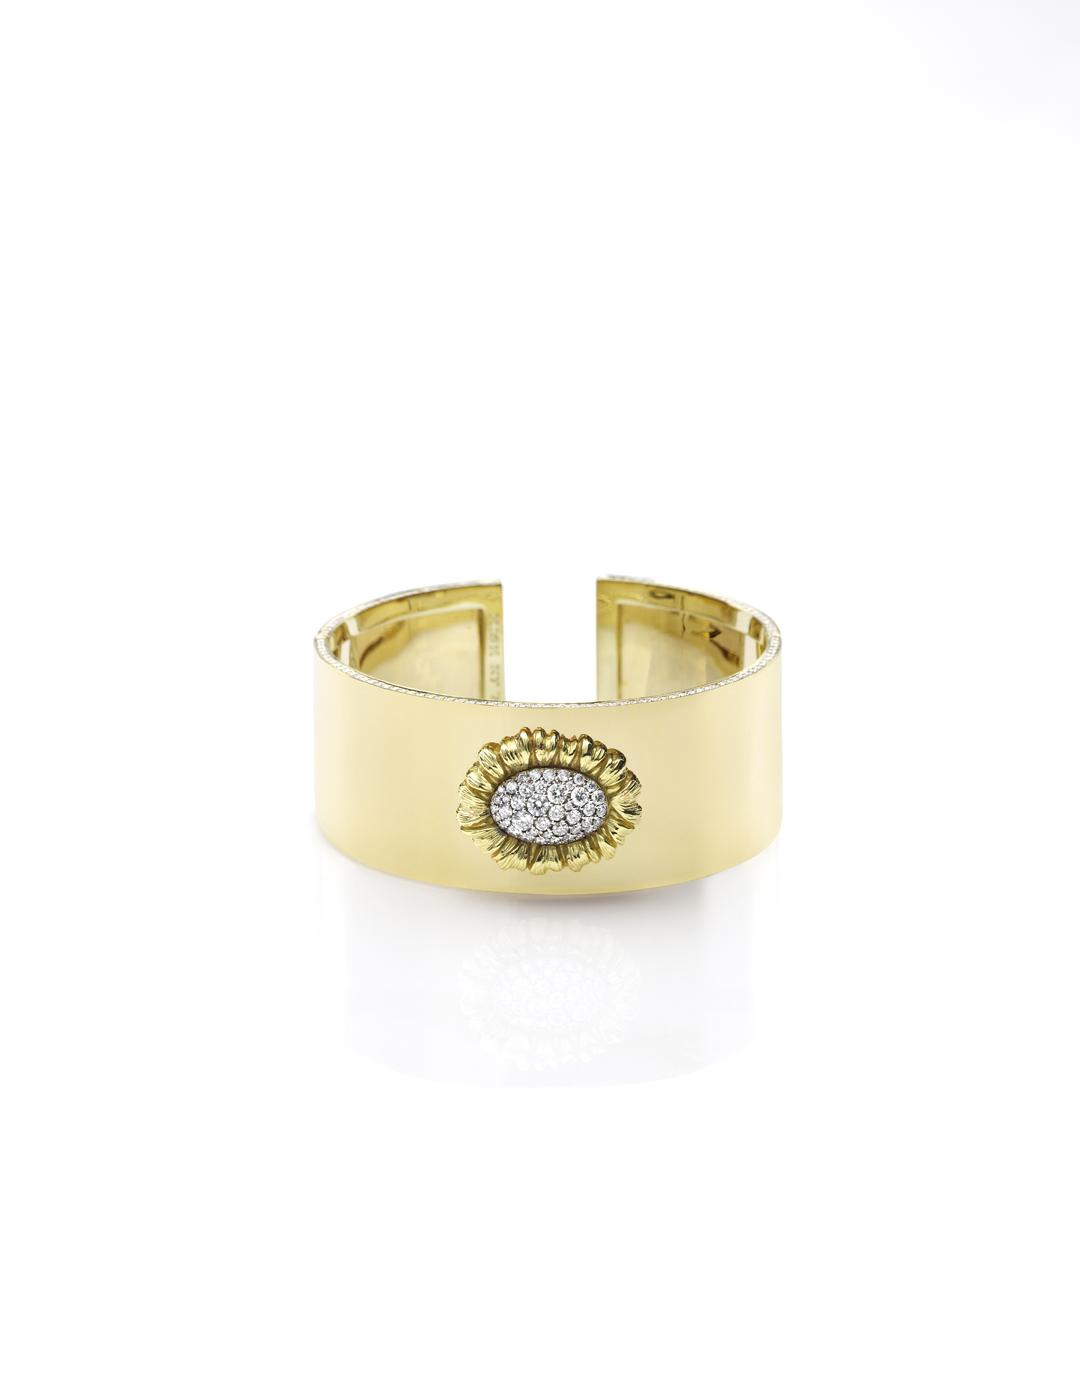 mish_jewelry_product_Nigella-YG-Cuff-1